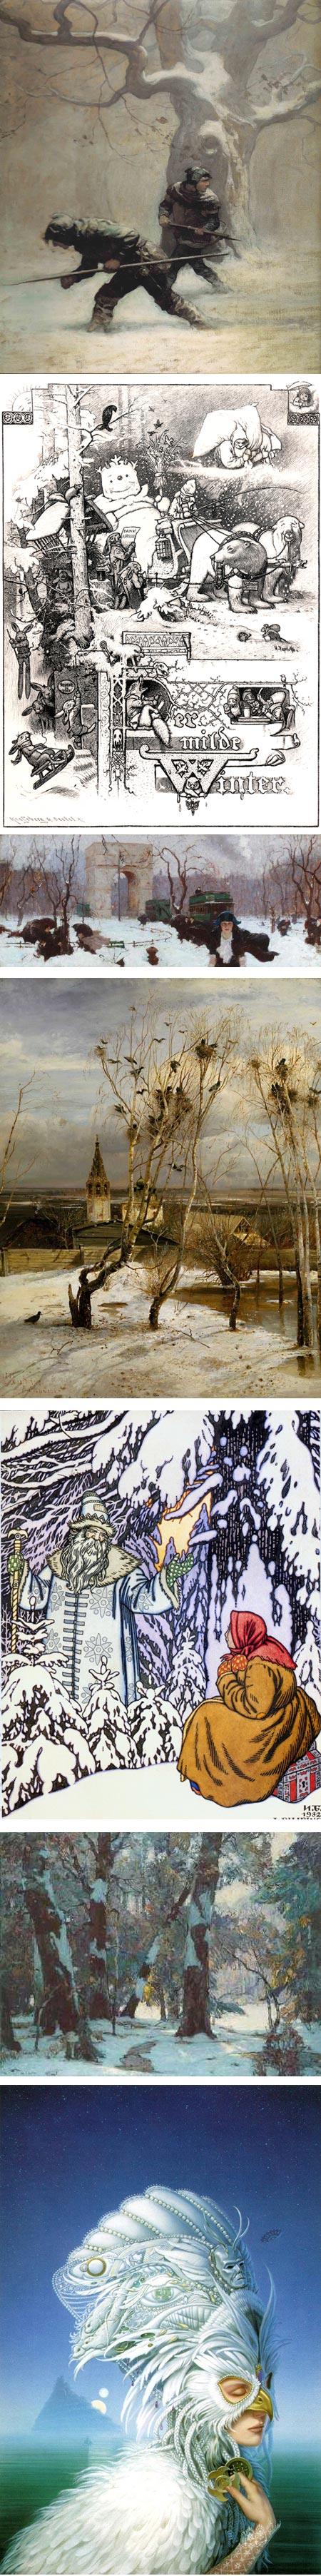 Picturing Winter on Tor.com: N.C. Wyeth, Hermann Vogel, Dean Cornwell, Aleksey Savrasov, Ivan Bilibin, John Fabian Carlson, Michael Whelan